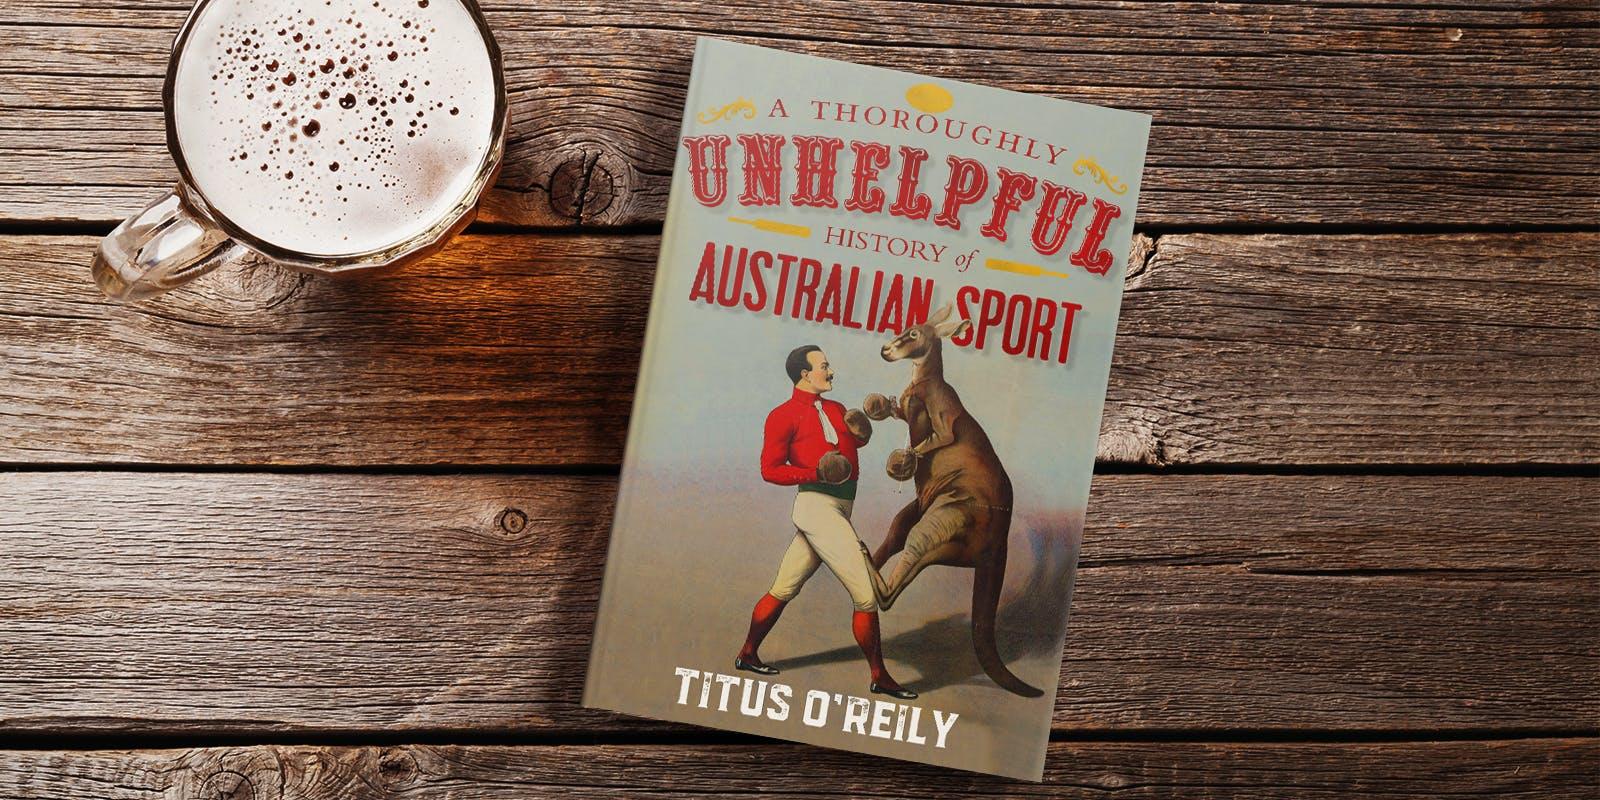 The origins of Australian Rules